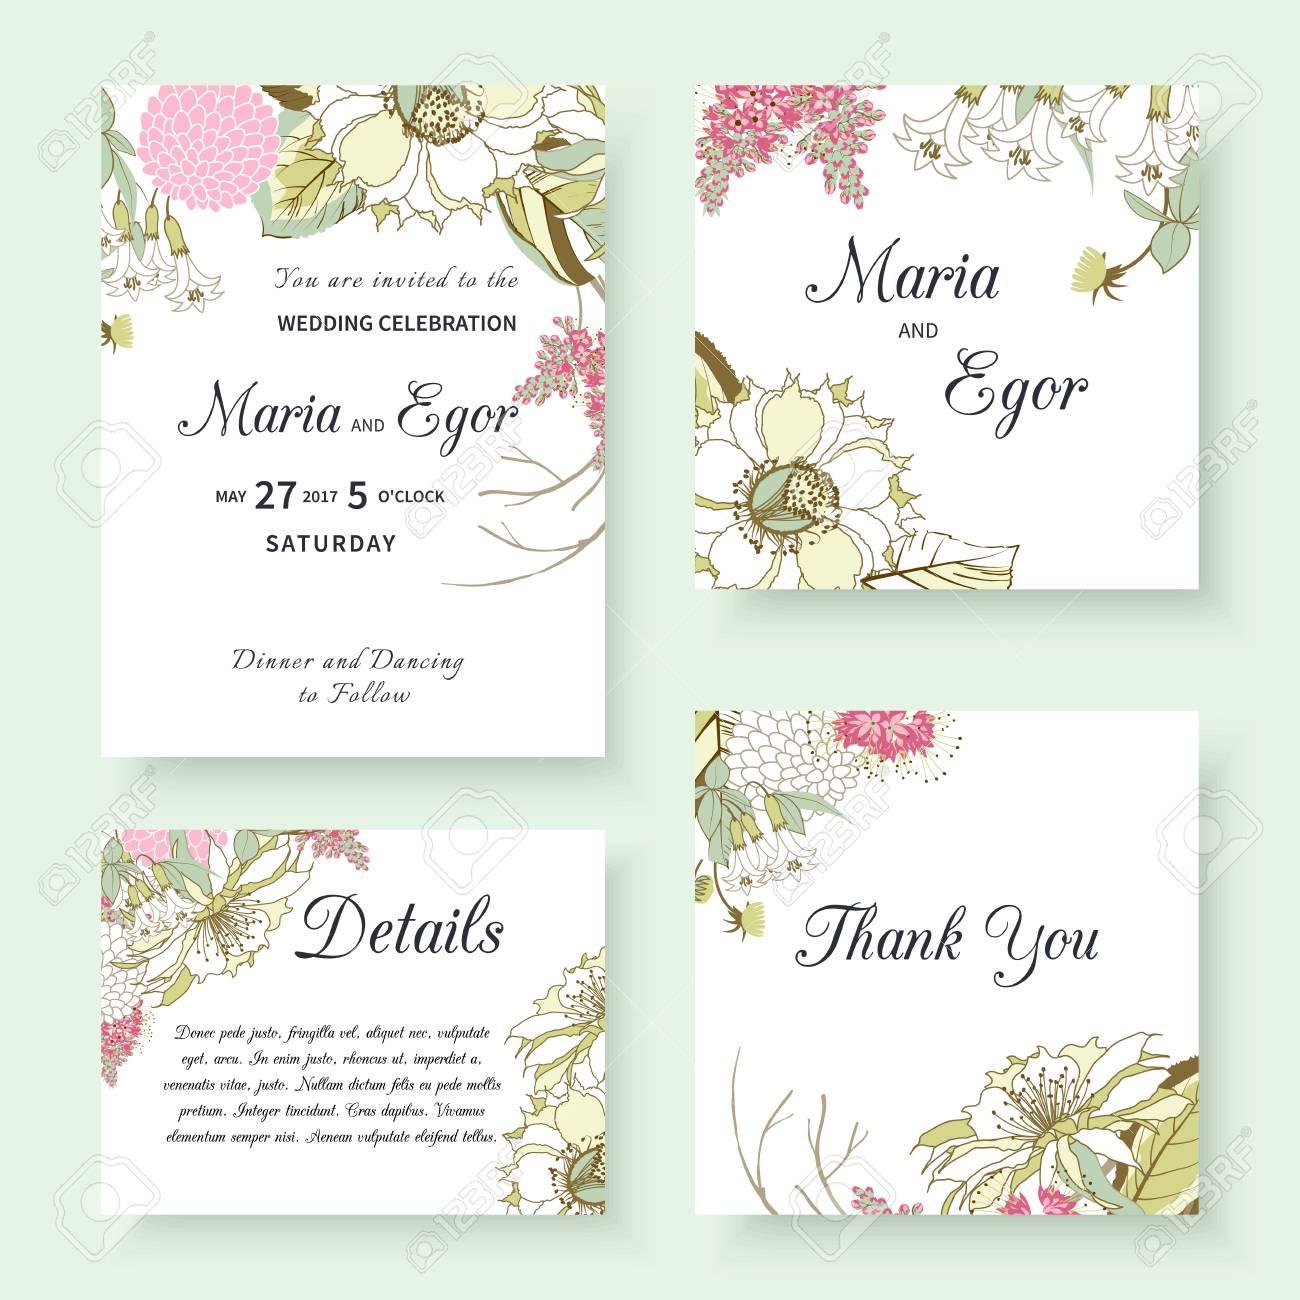 Wedding Invitation Templates With Spring Flower Designs